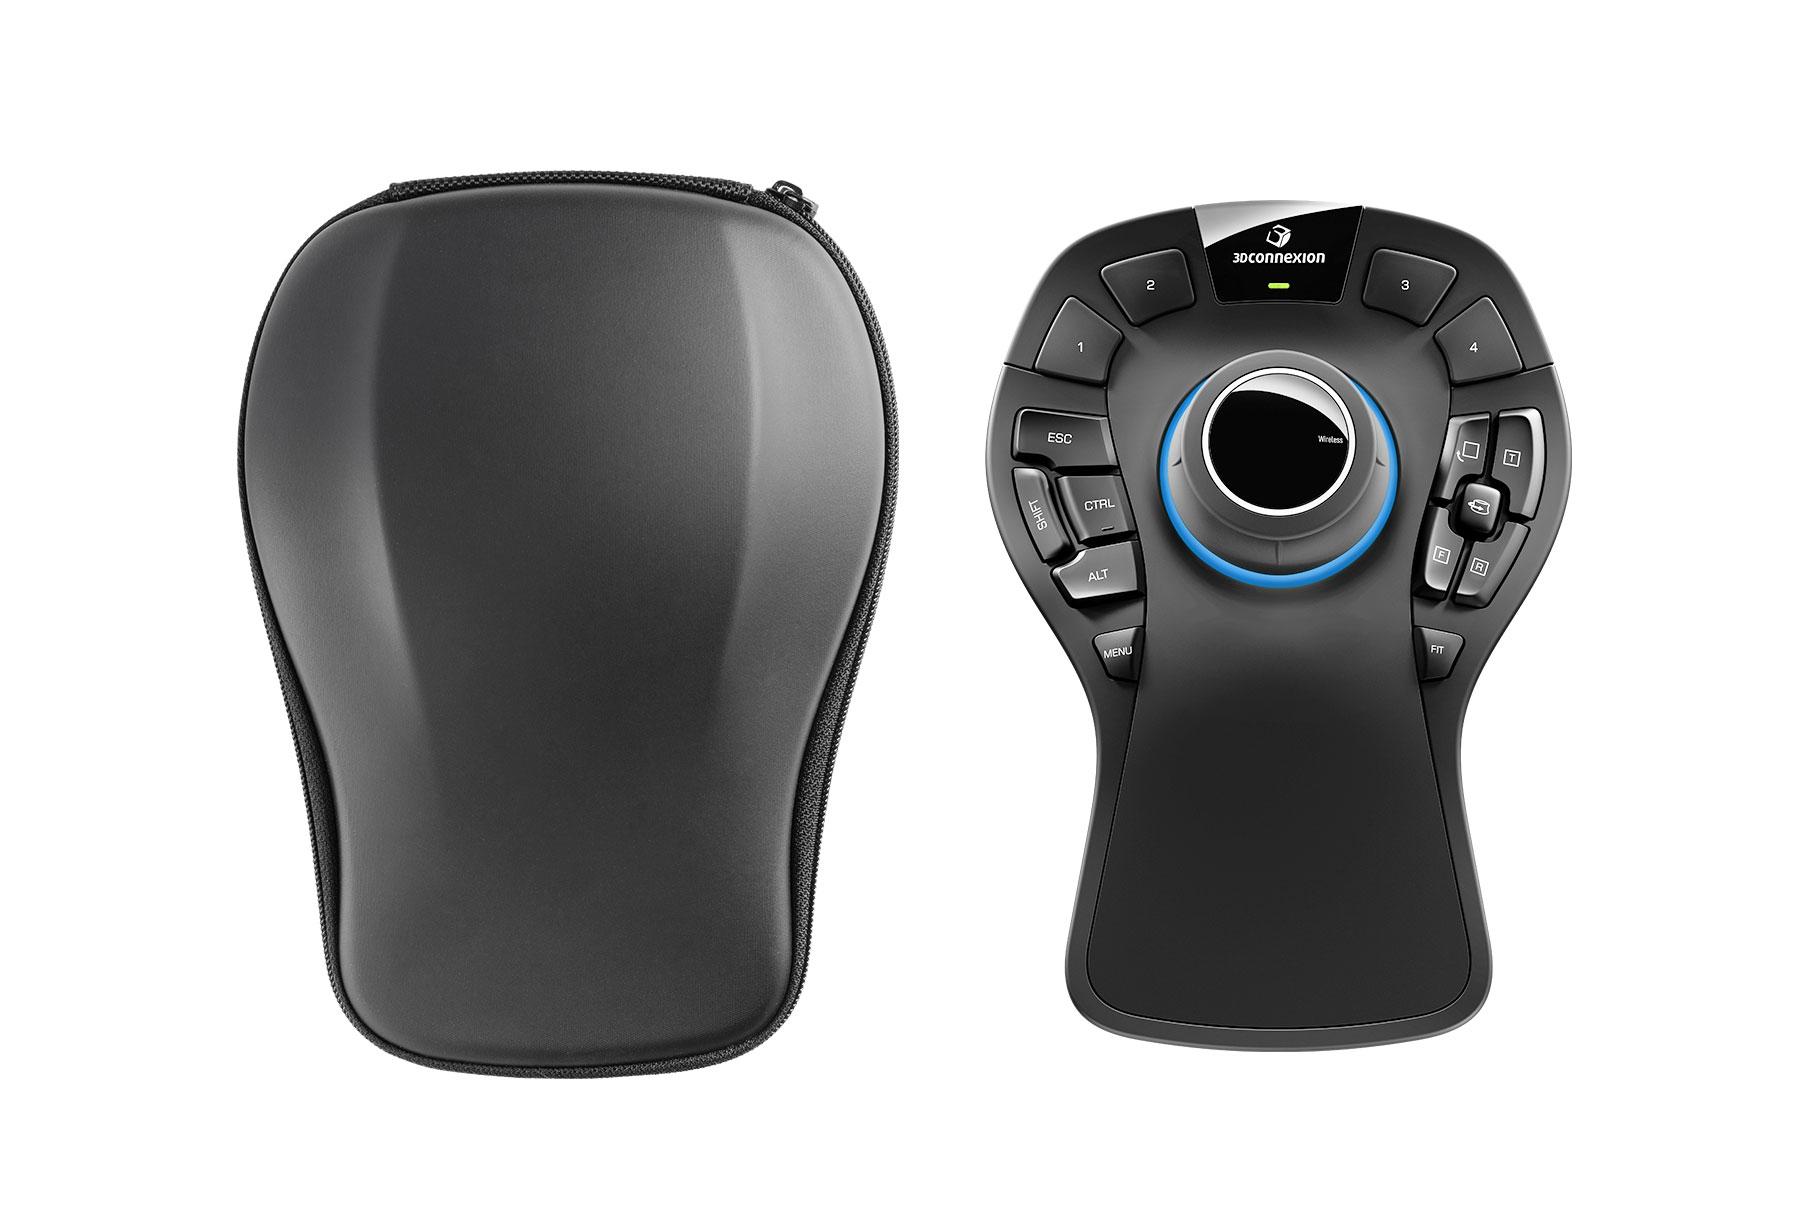 3DX-700075